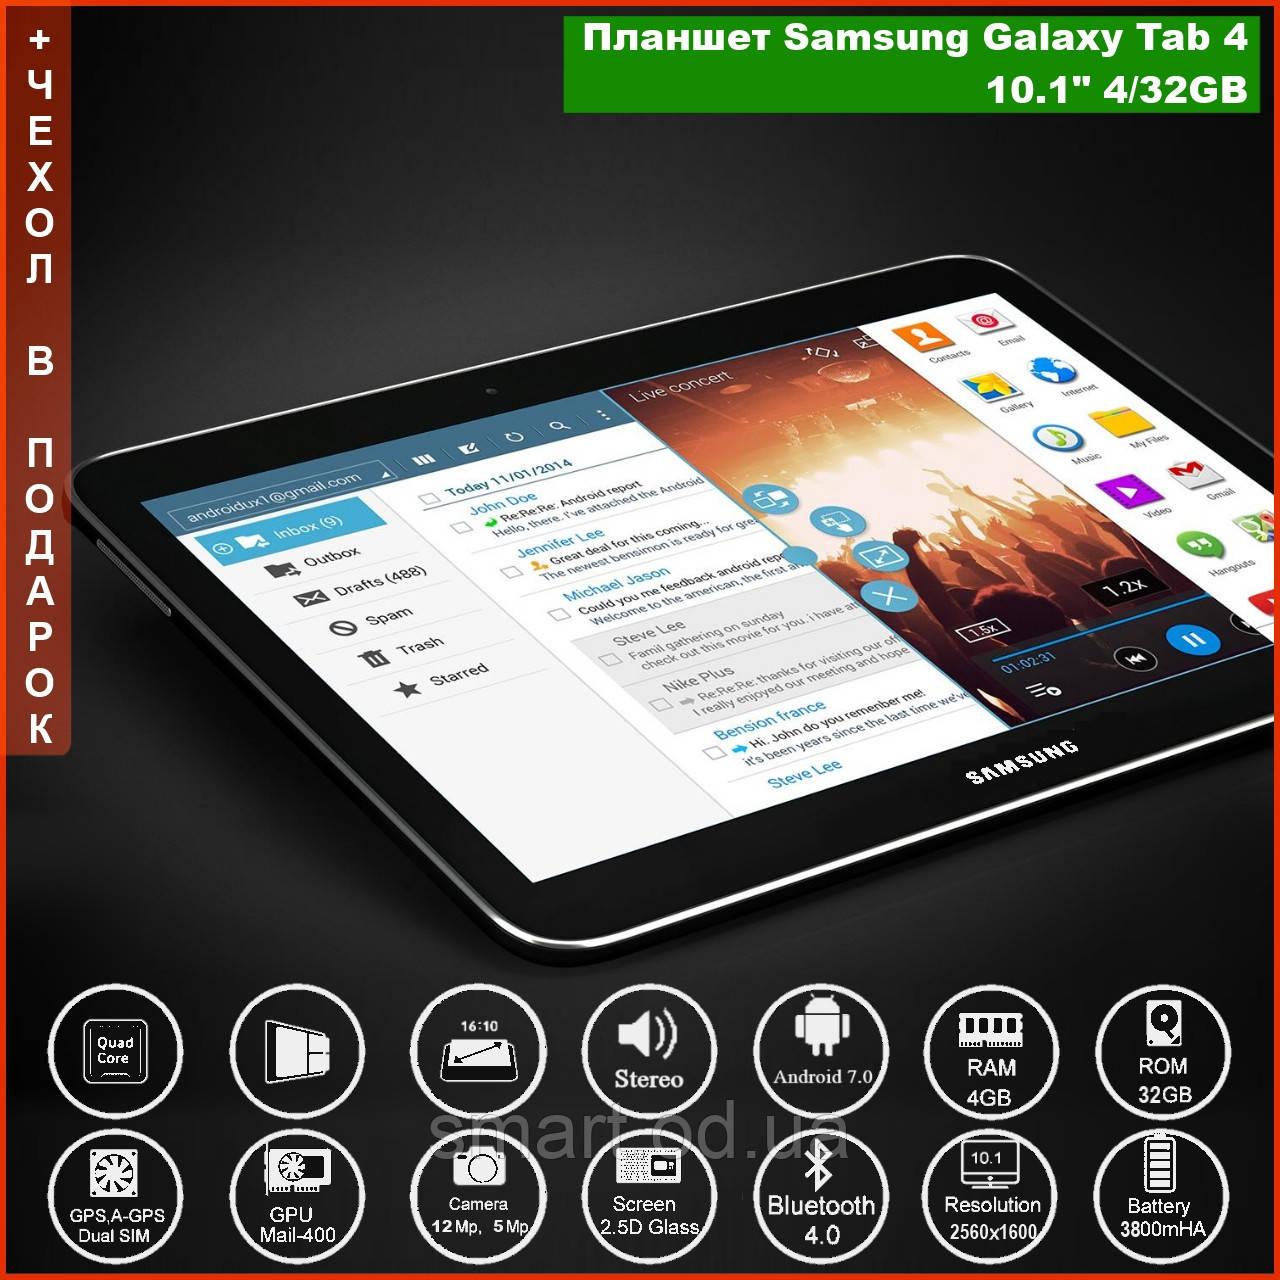 "Планшет телефон Samsung Galaxy Tab 4 10.1"" экран IPS Full HD+ | 8 Ядер, 4/32GB, WiFi /3G / 4G, 2 Sim Самсунг"